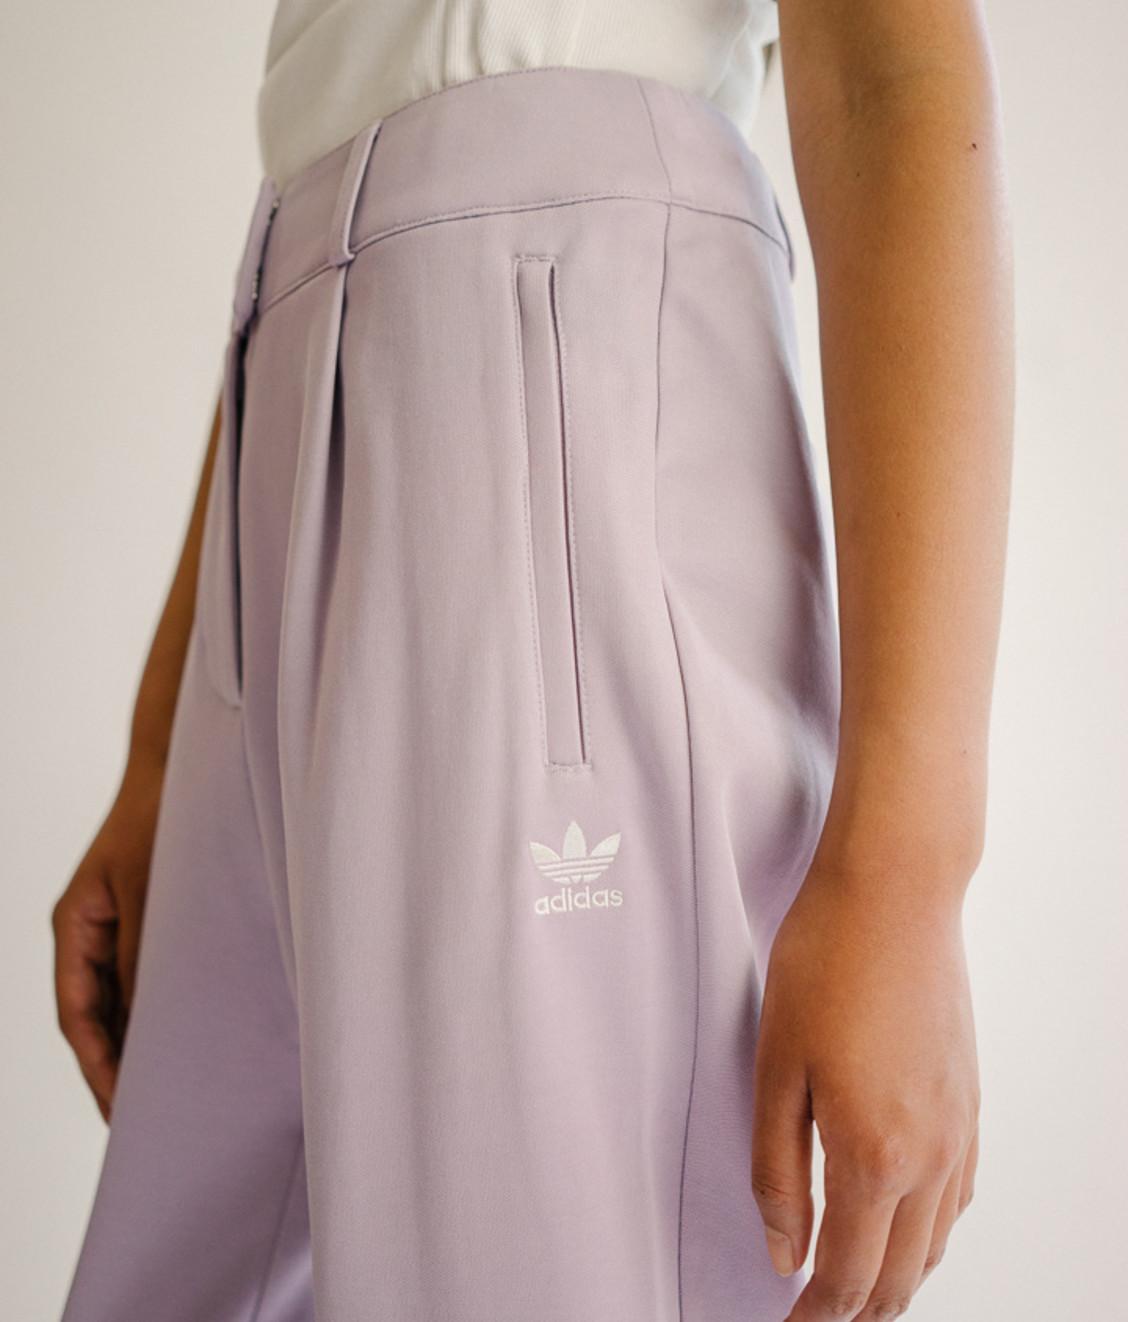 Adidas Adidas x DC Trousers Soft Vision